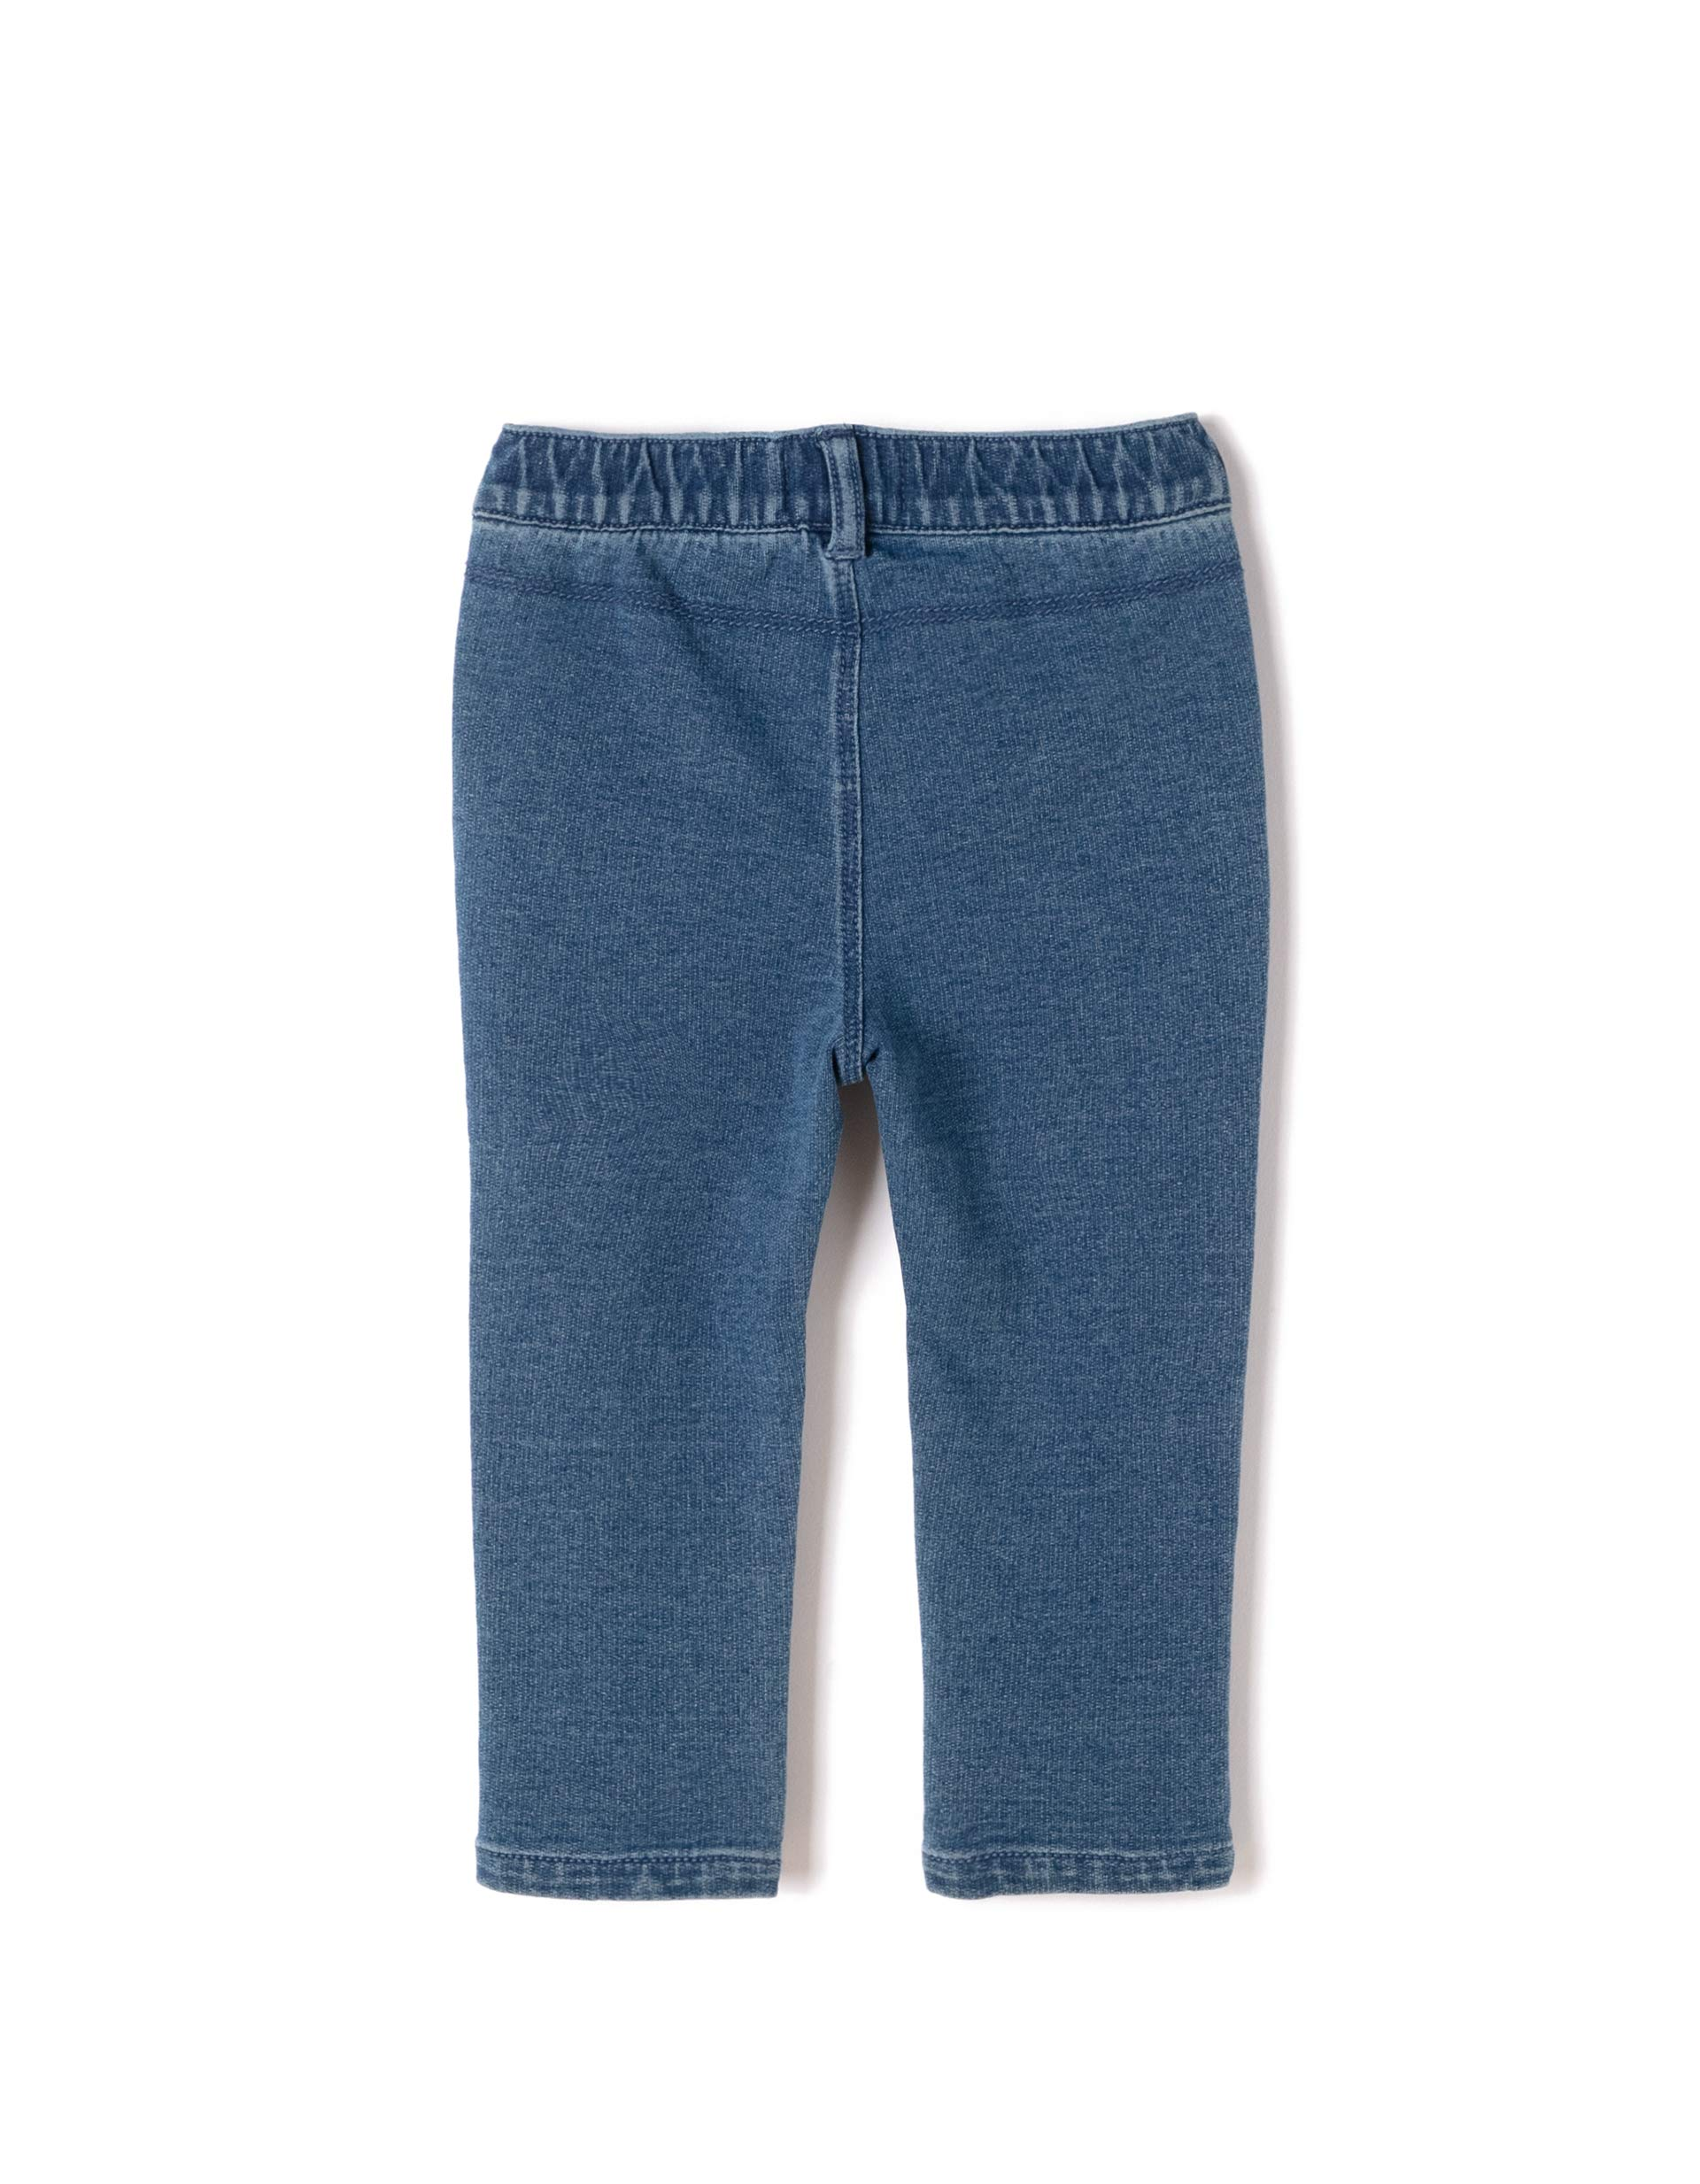 ZIPPY Jeggings Star Pantalones para Bebés 2